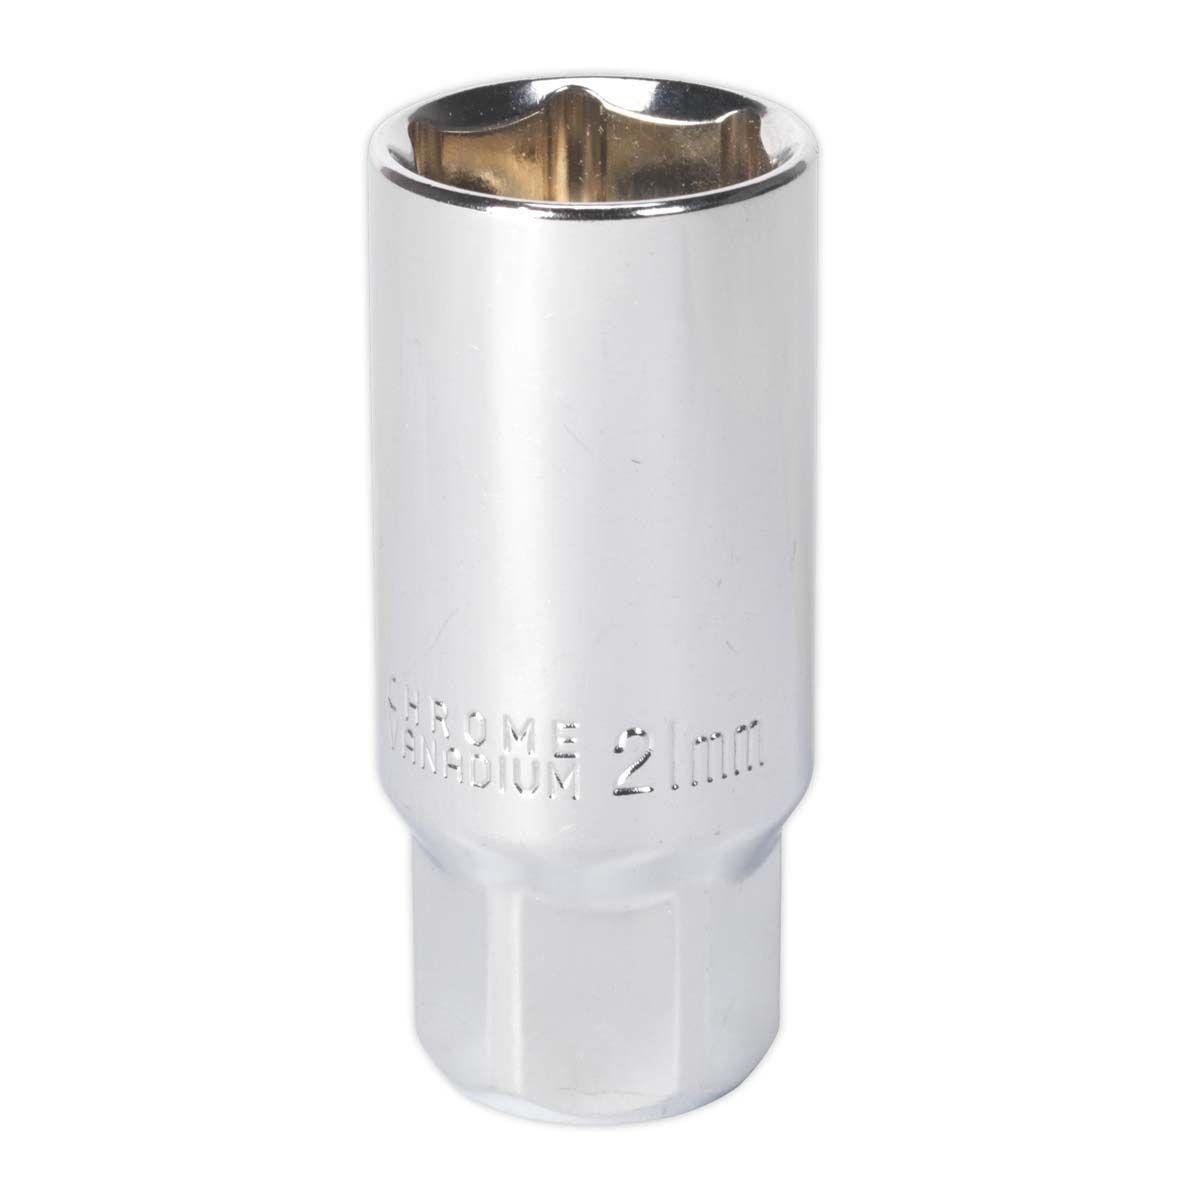 "Sealey Spark Plug Socket 21mm 3/8""Sq Drive Magnetic"